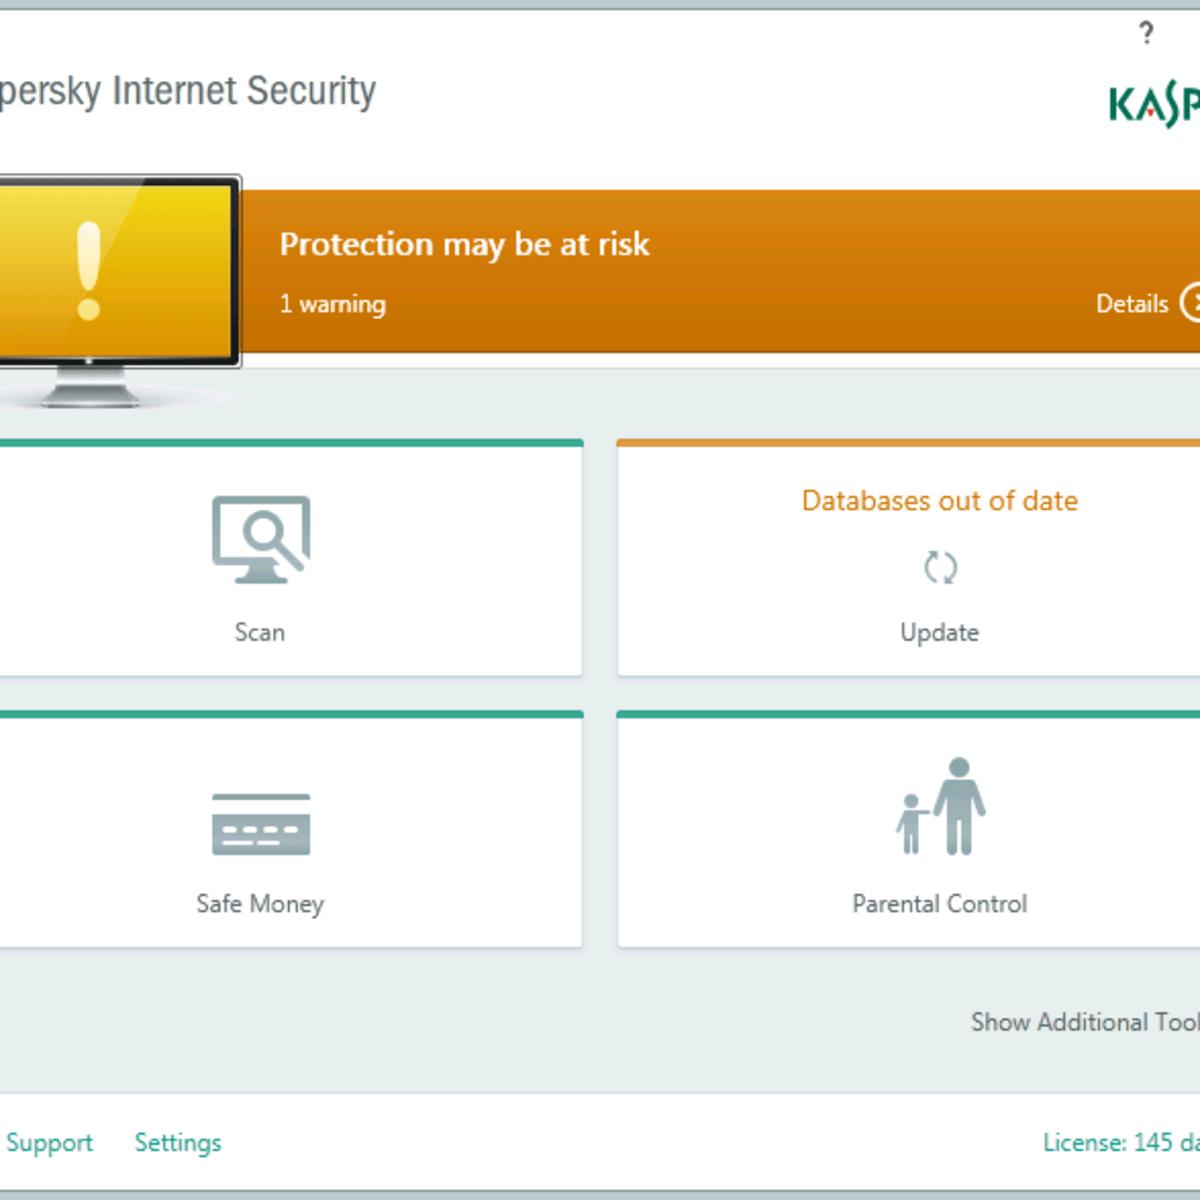 Kaspersky error updating klava giffgaff we are updating your goodybags